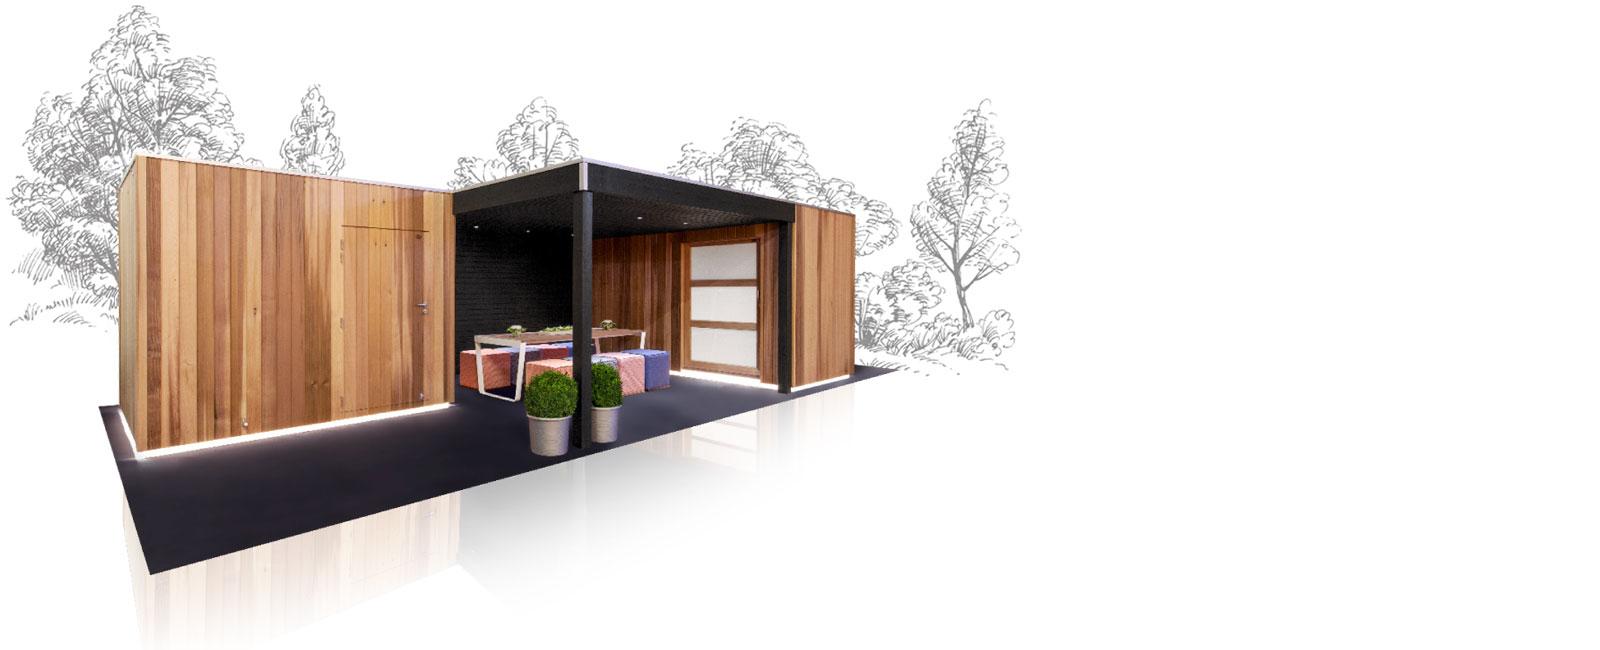 Le Seul Vrai Fabricant Abris | Christiaens Yvan® avec Fabricant Abri De Jardin Belgique